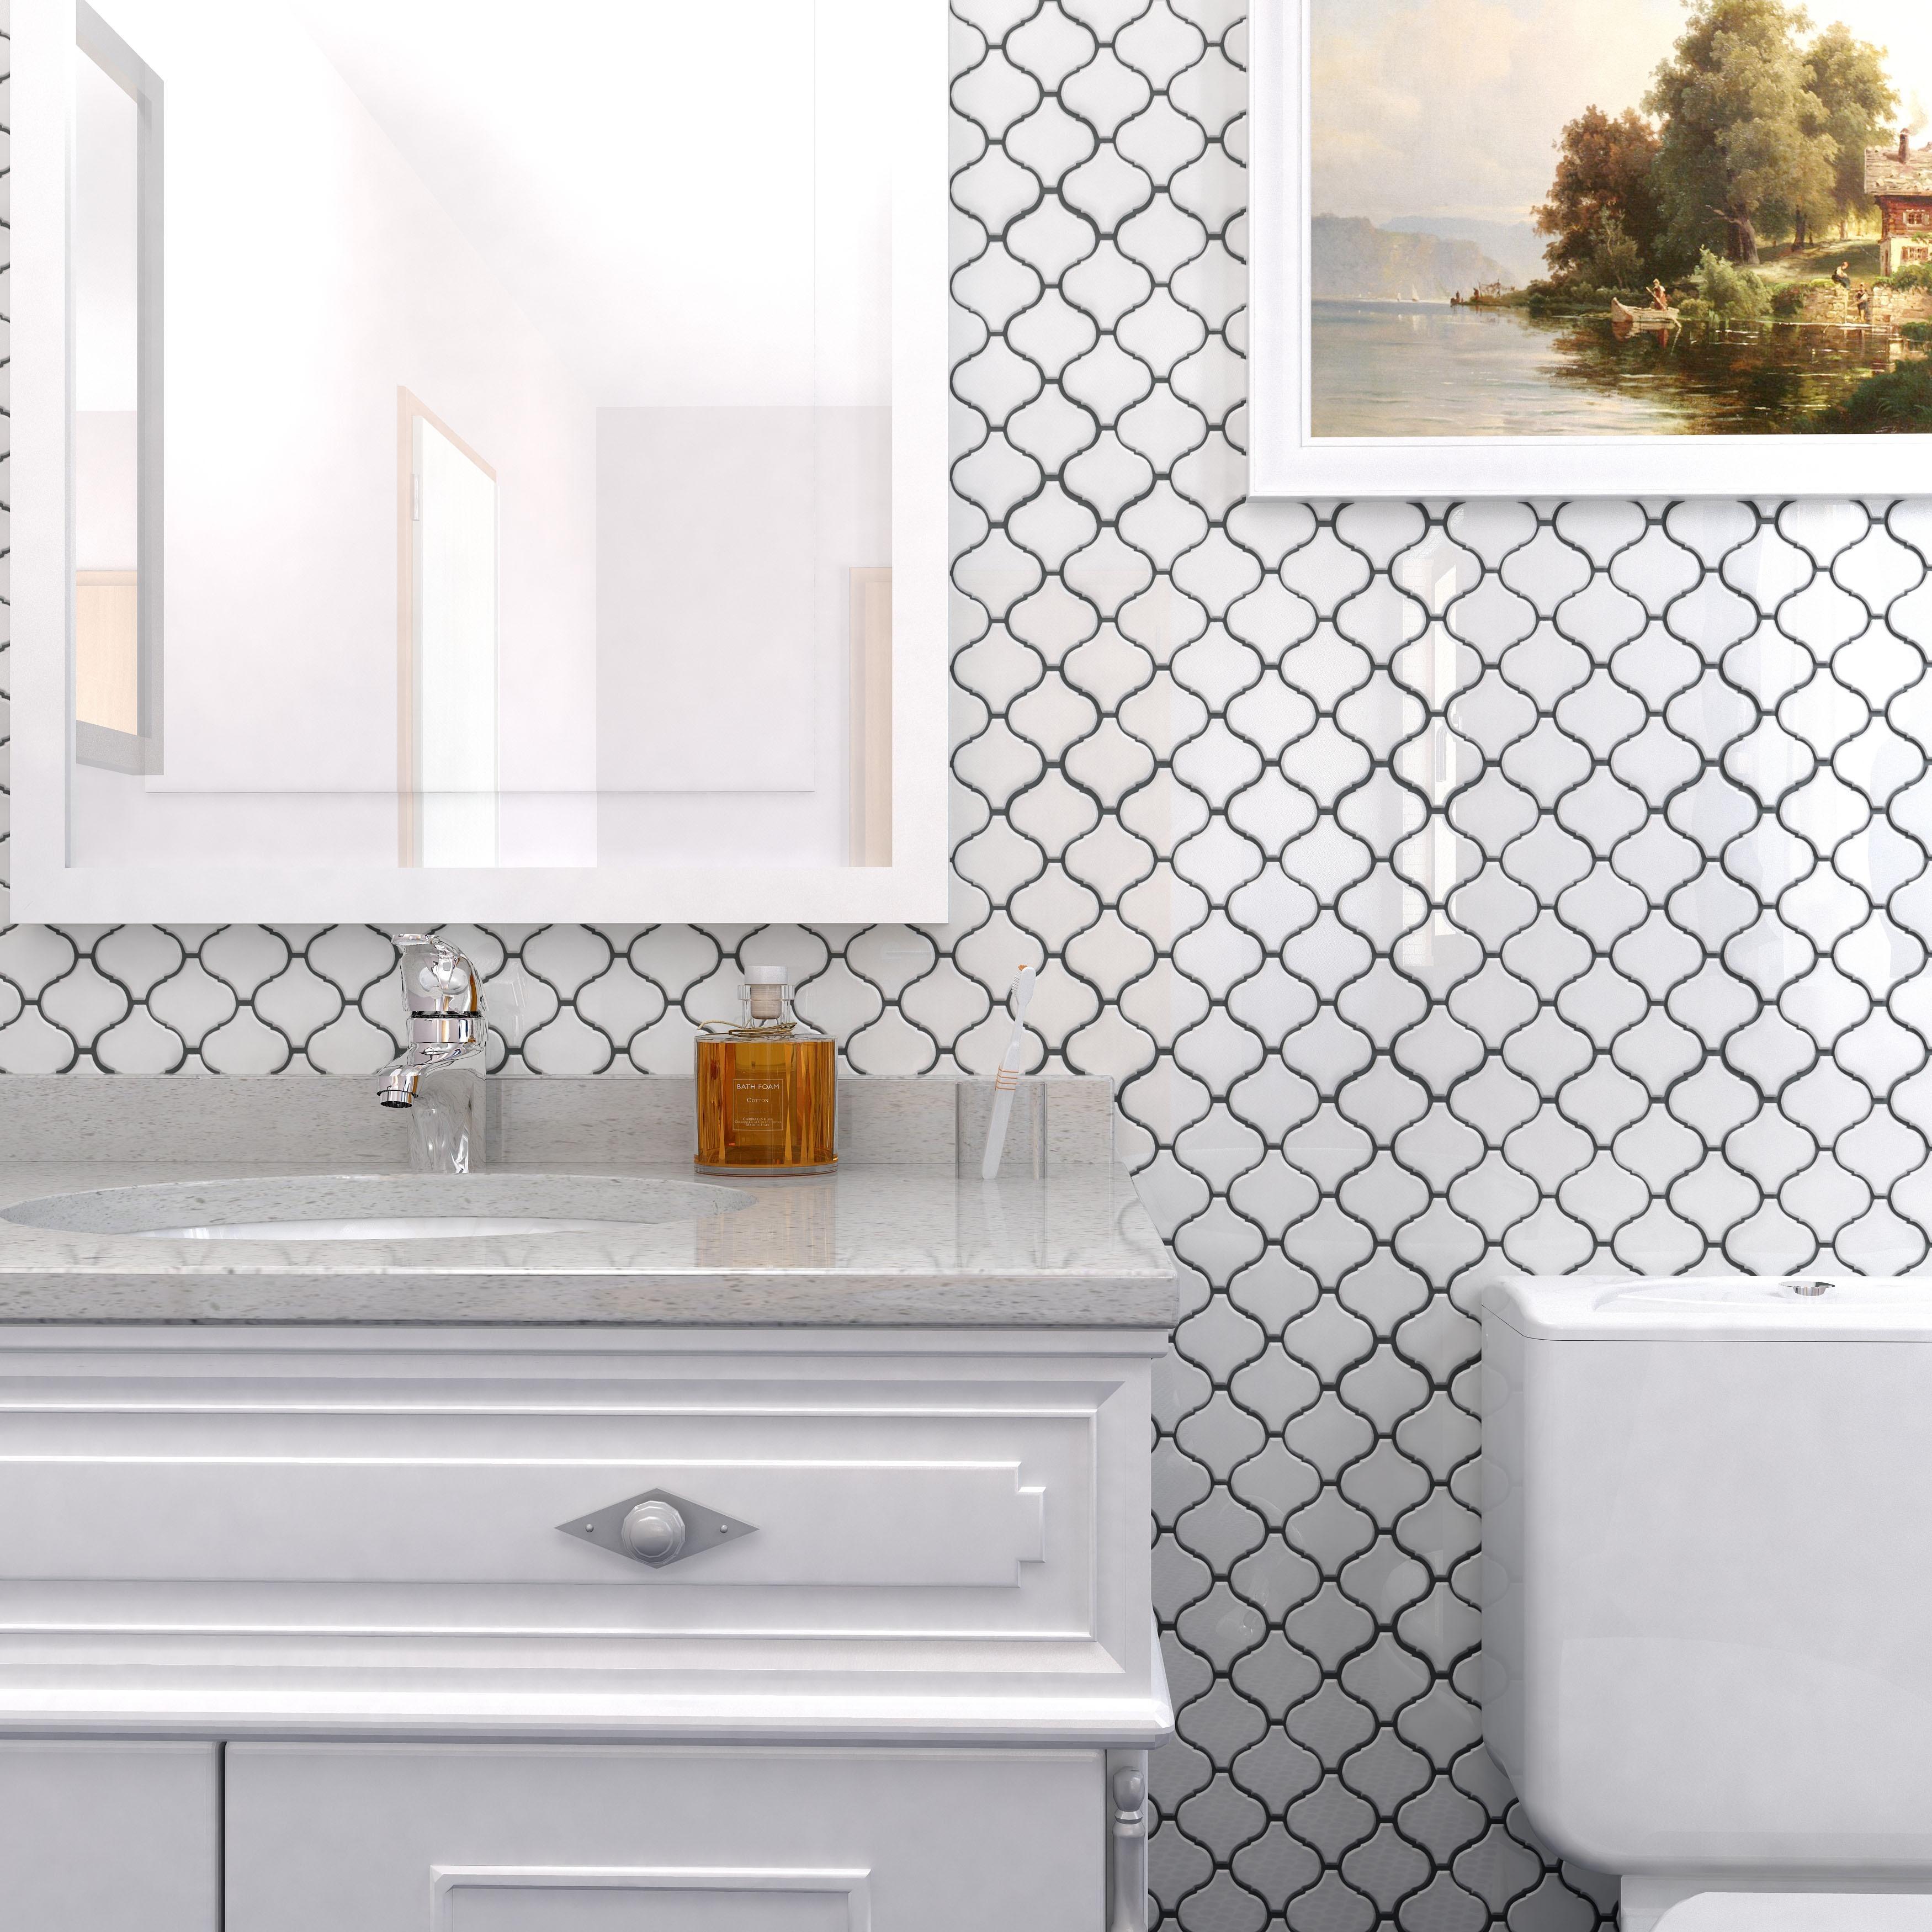 Somertile 9 5x10 75 Inch Marrah Lantern Glossy White Porcelain Mosaic Floor And Wall Tile 10 Tiles 7 27 Sqft